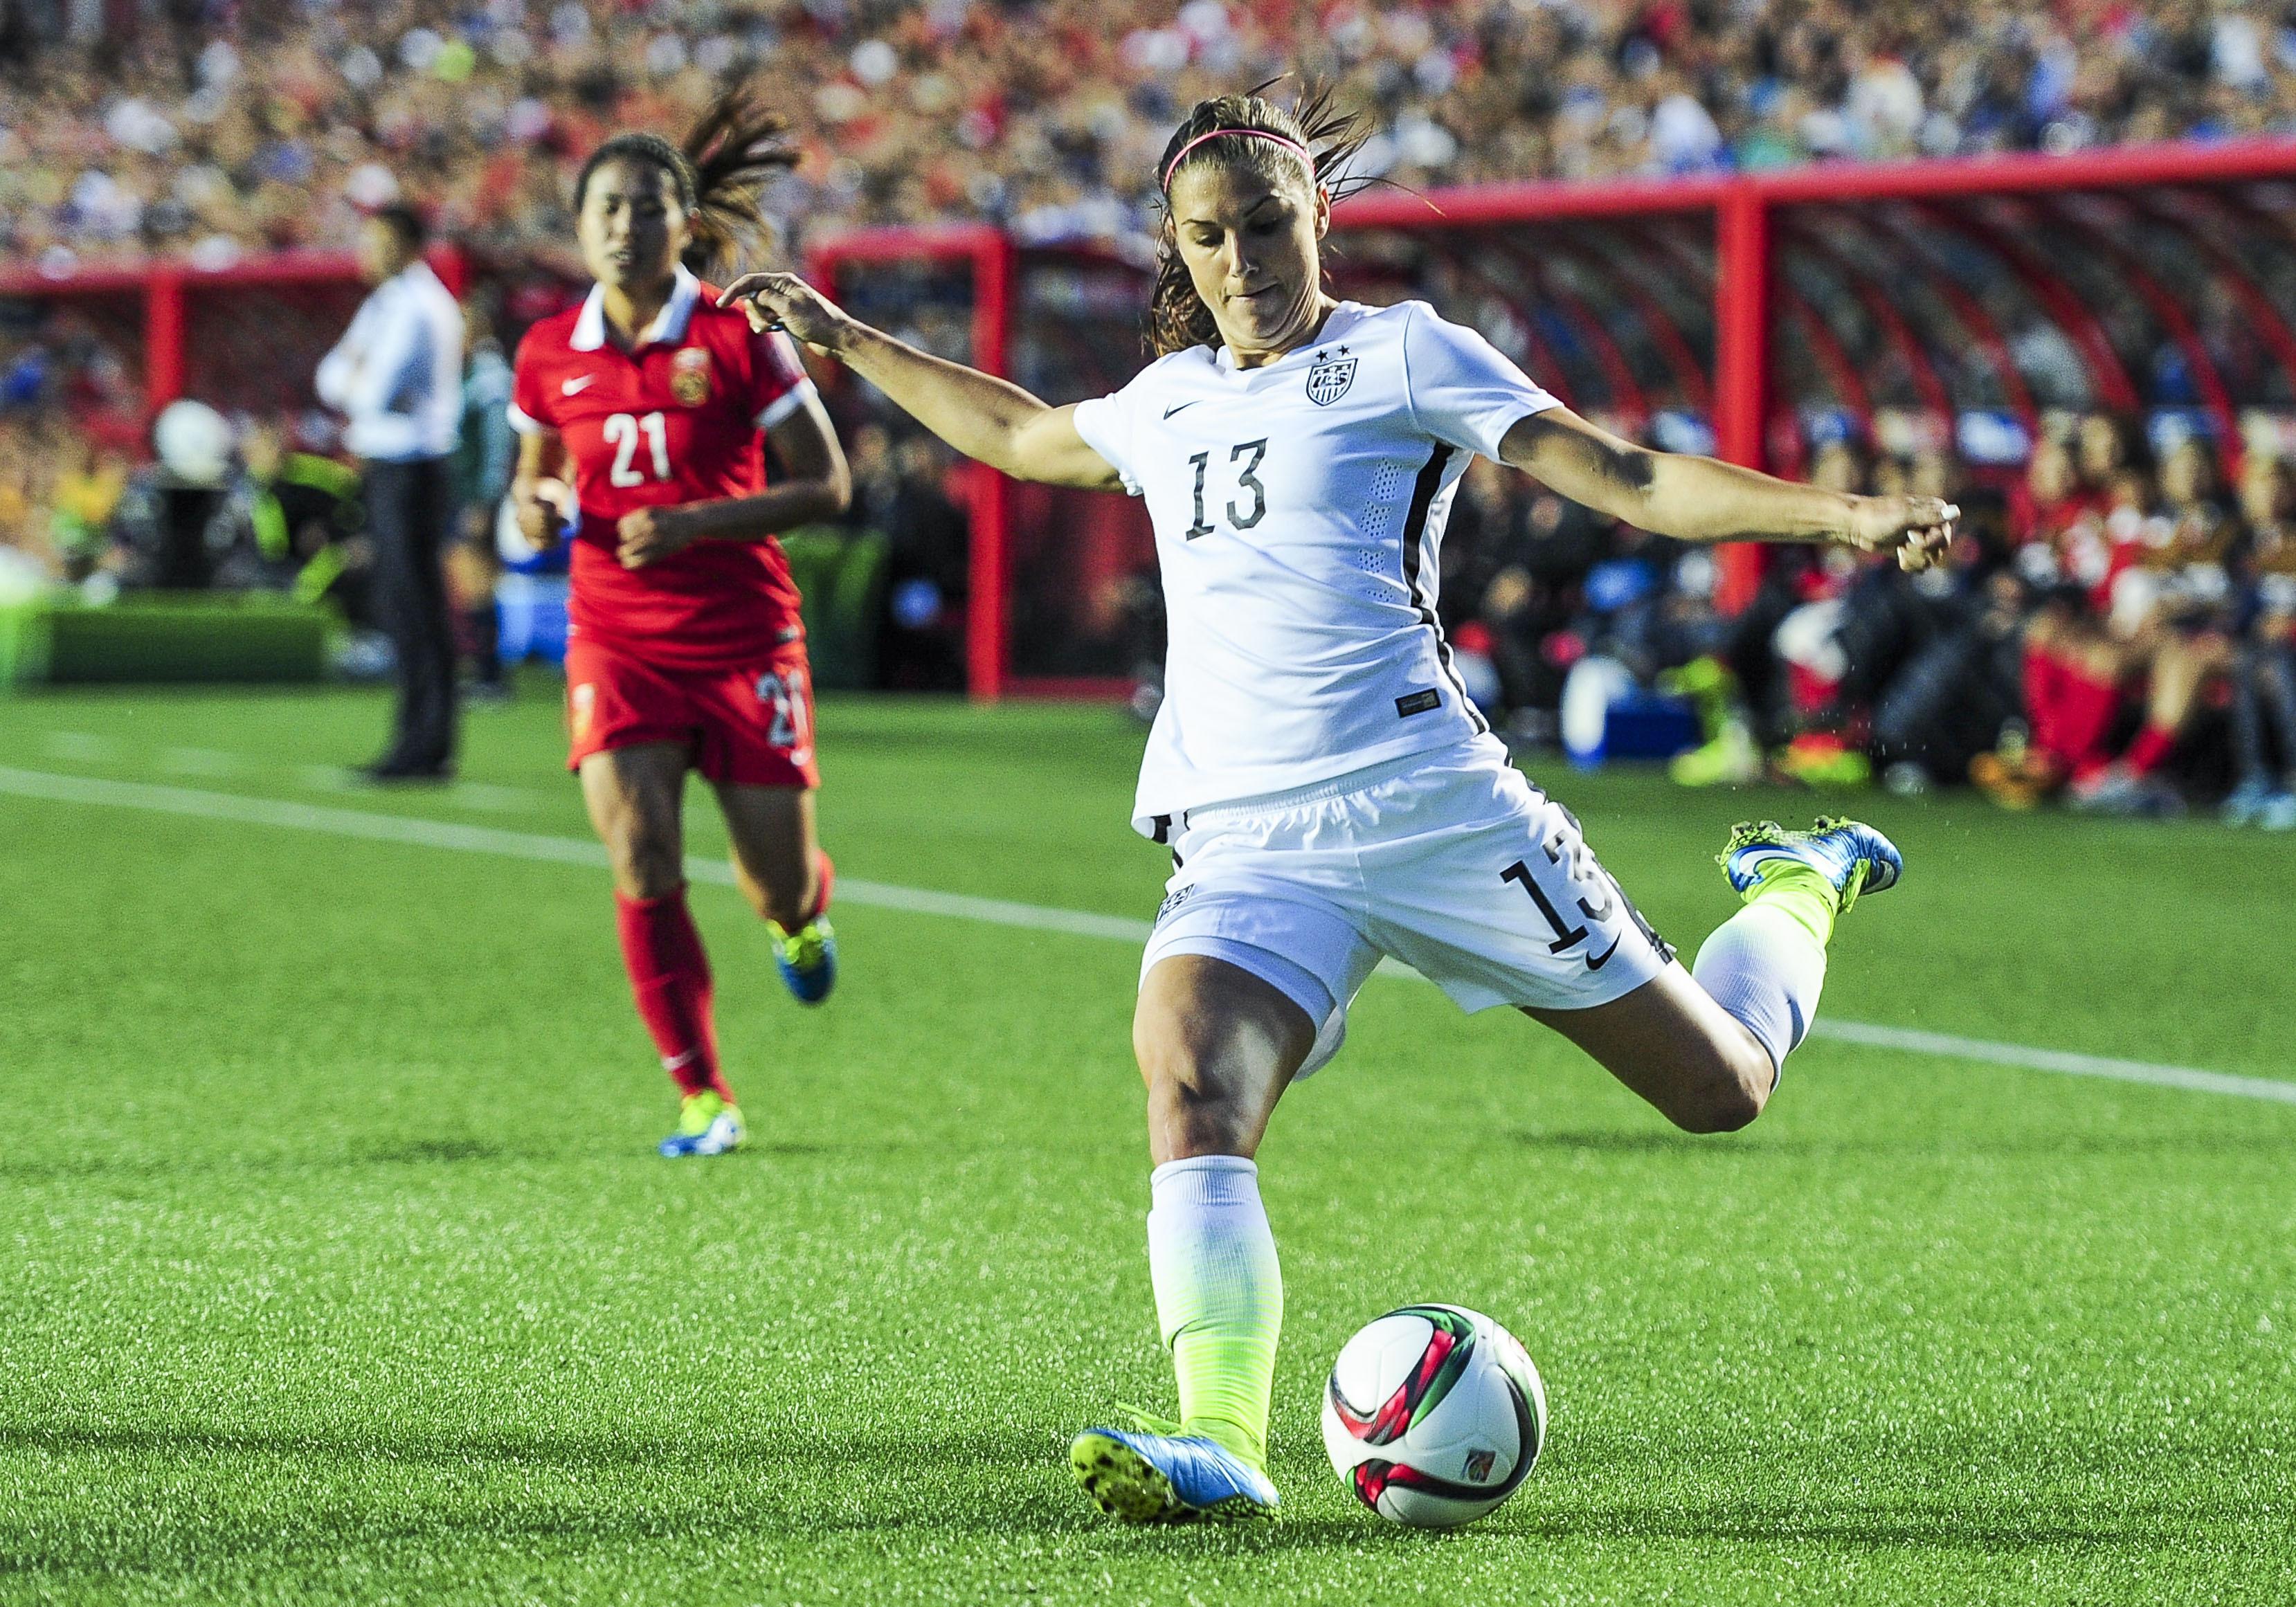 SOCCER: JUN 26 FIFA Women's World Cup - Quarter-Final - China v USA